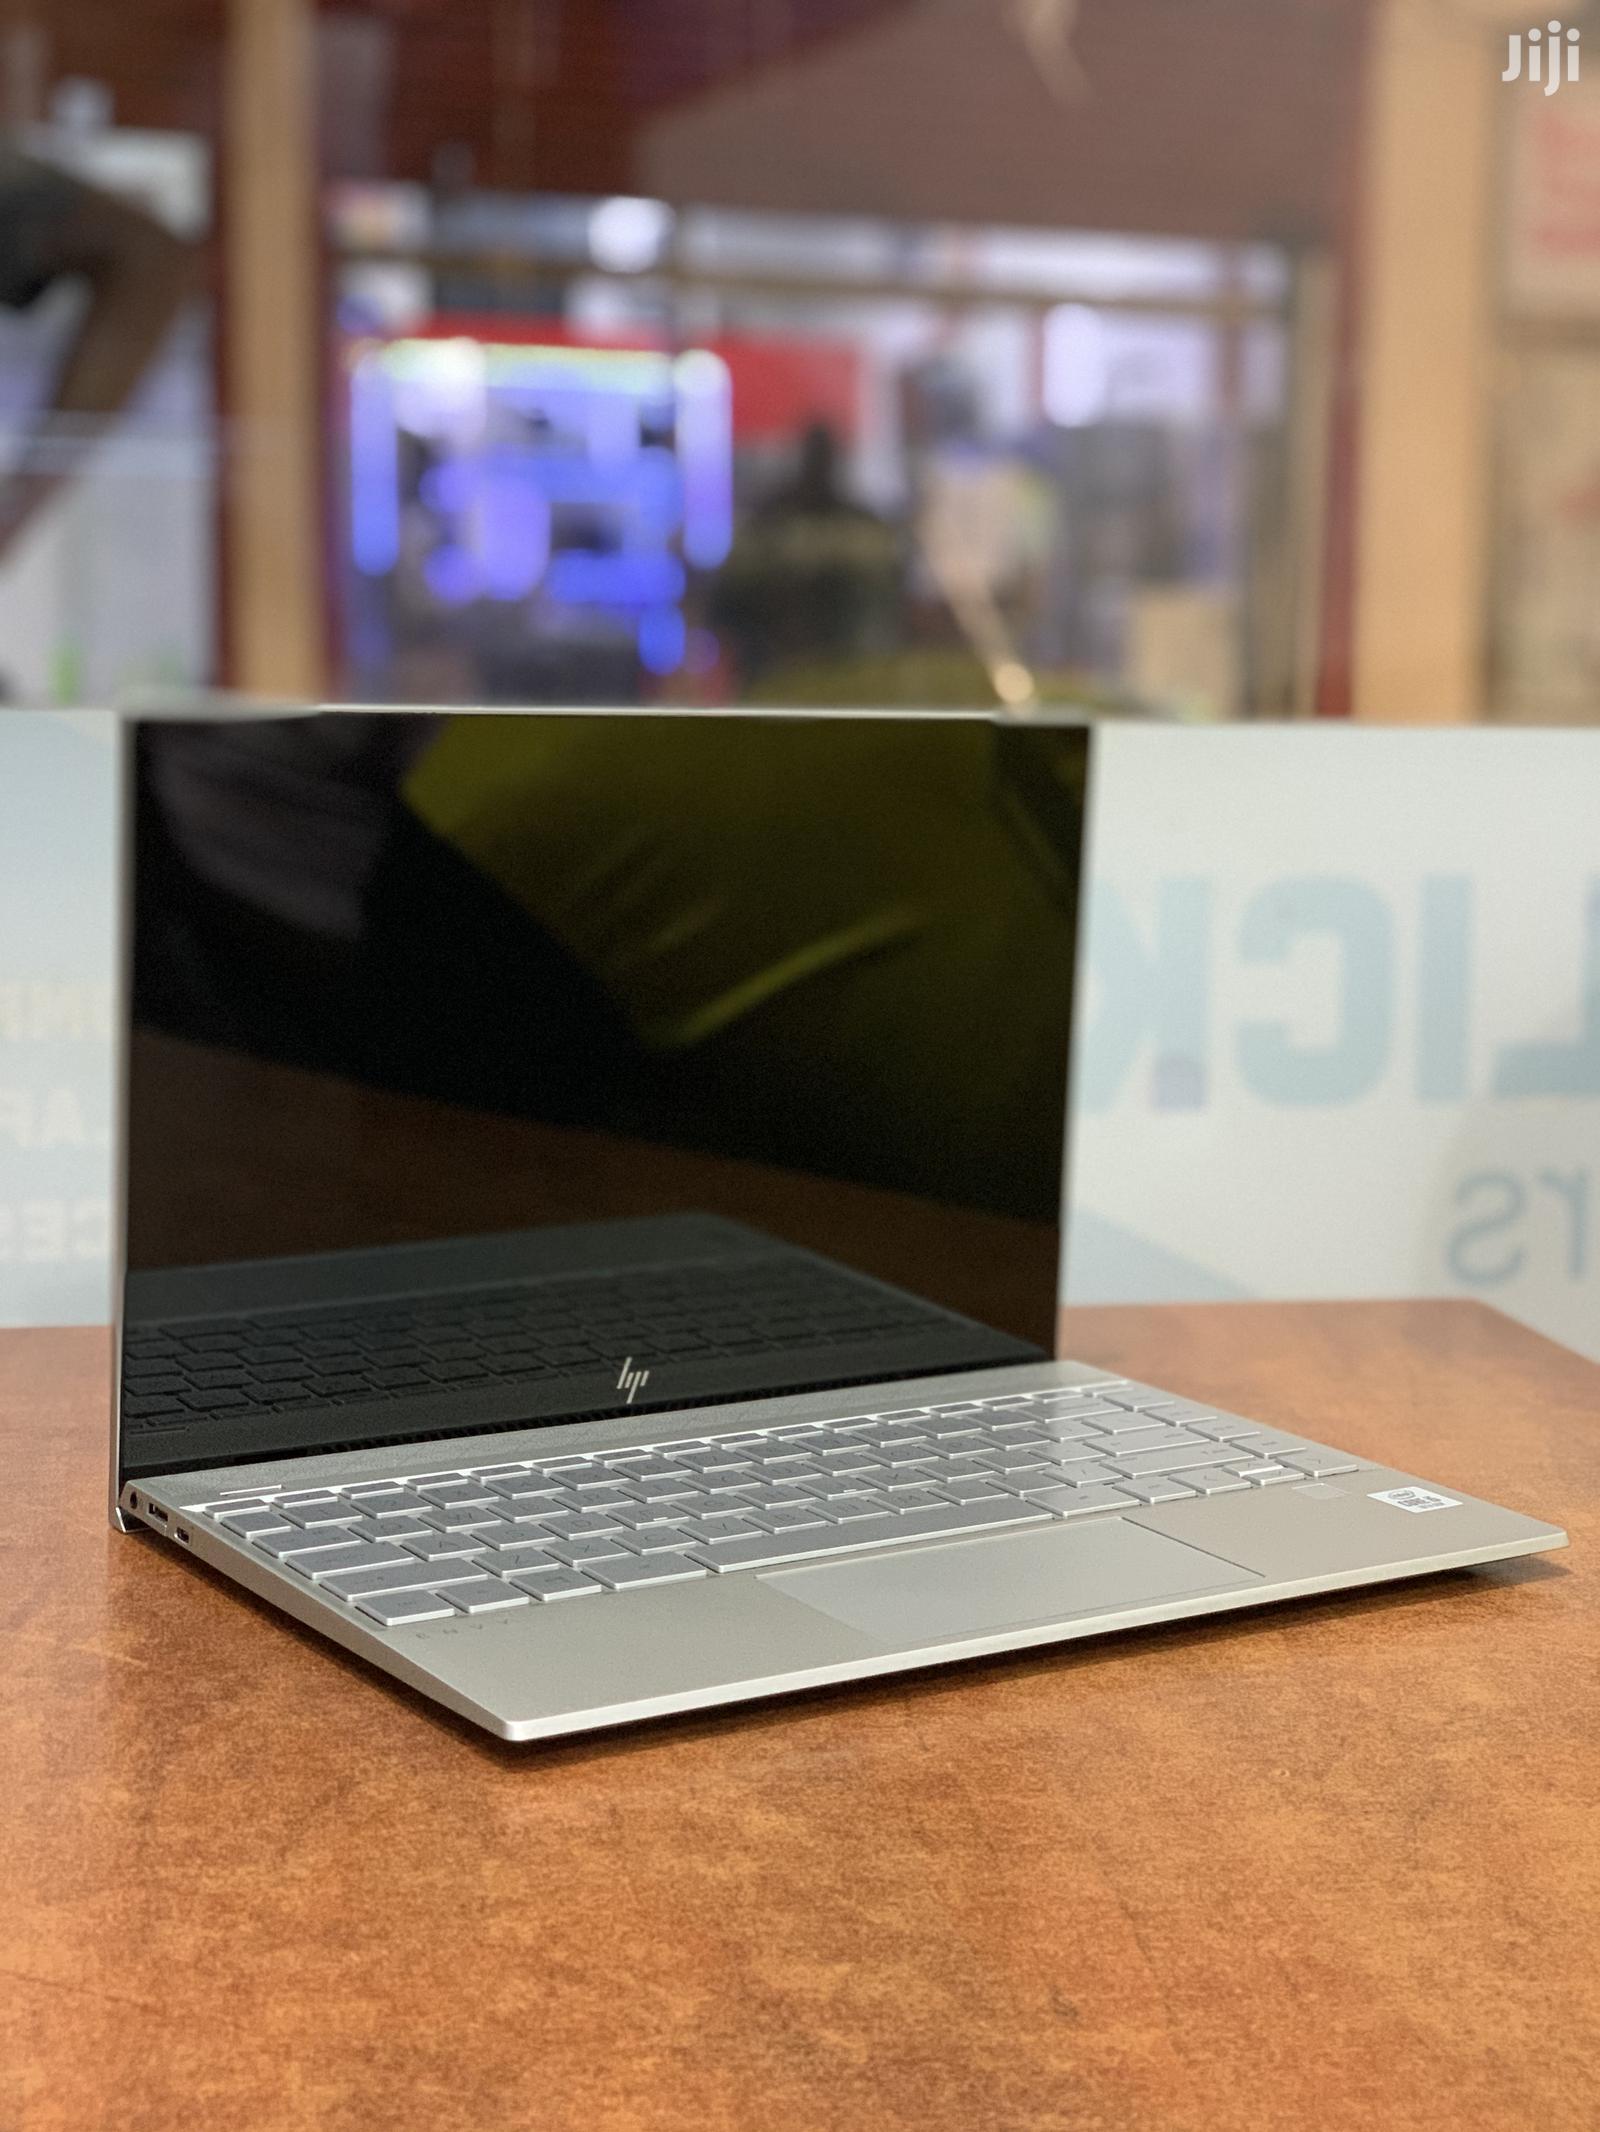 Archive: New Laptop HP Envy 13 8GB Intel Core I5 SSHD (Hybrid) 256GB